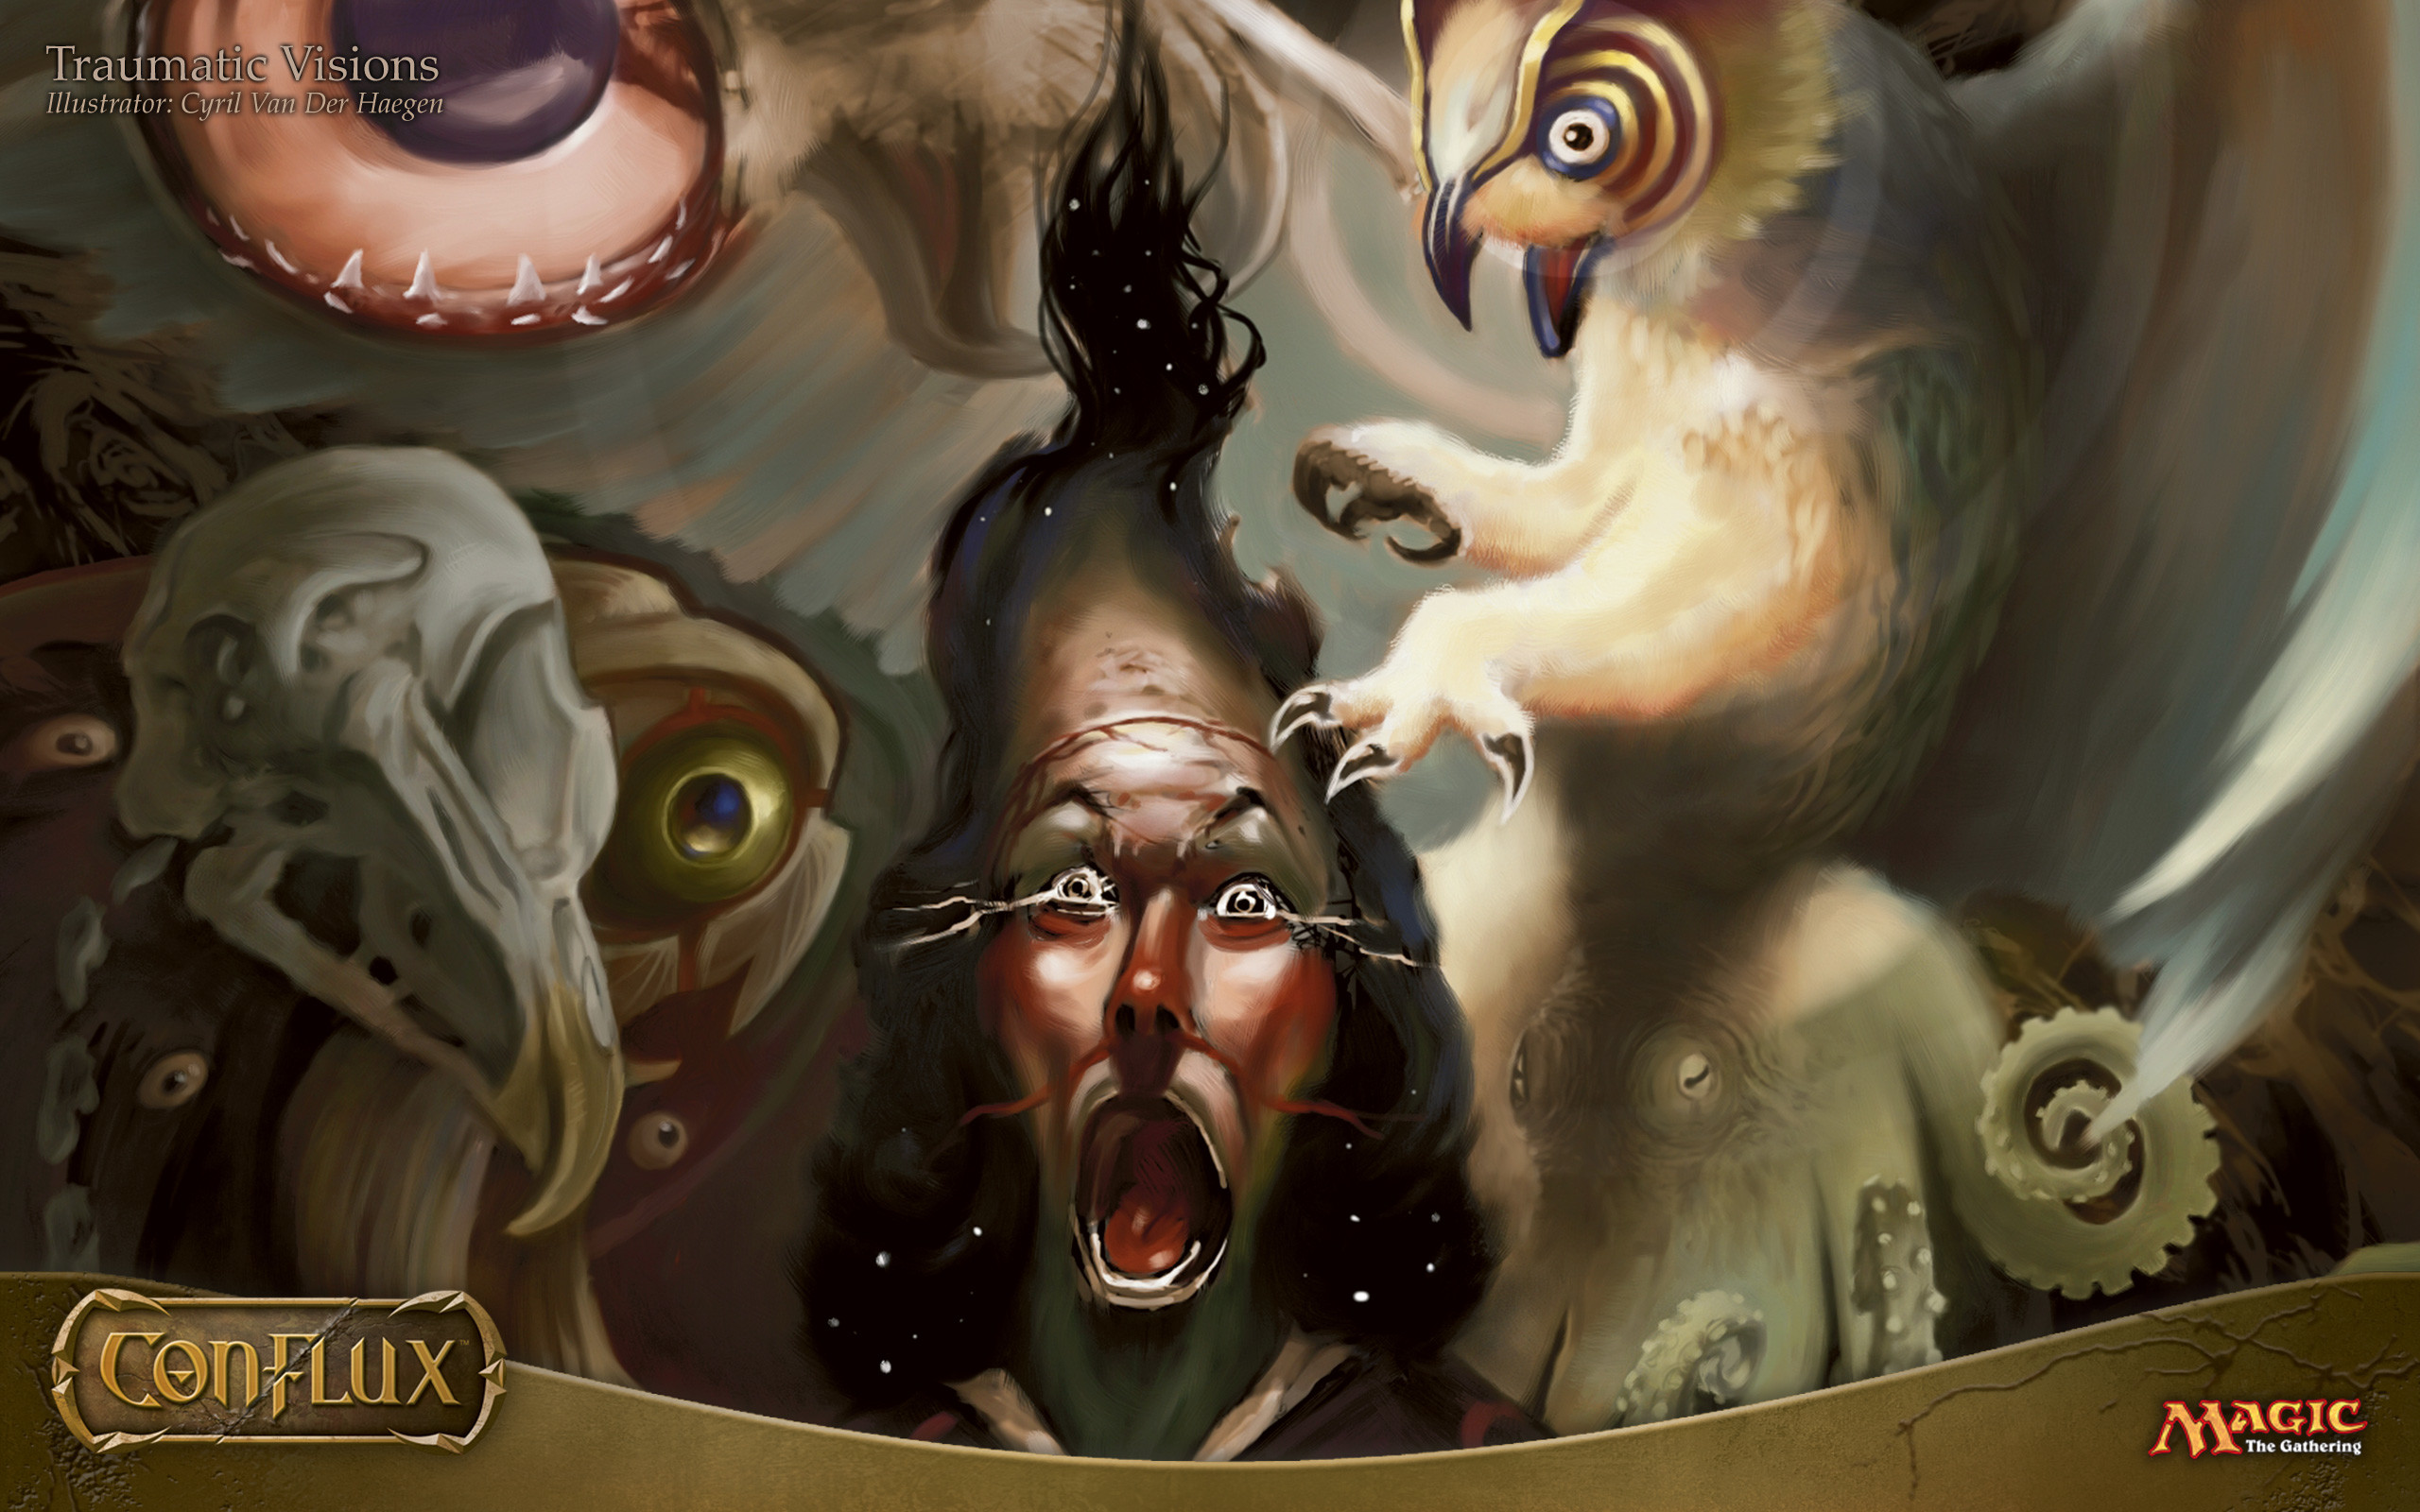 https://magic.wizards.com/sites/mtg/files/images/wallpaper/steF53BuB9_MM3_1920x1080_Wallpaper.jpg    MtG wallpaper   Pinterest   Mtg art and Monster …